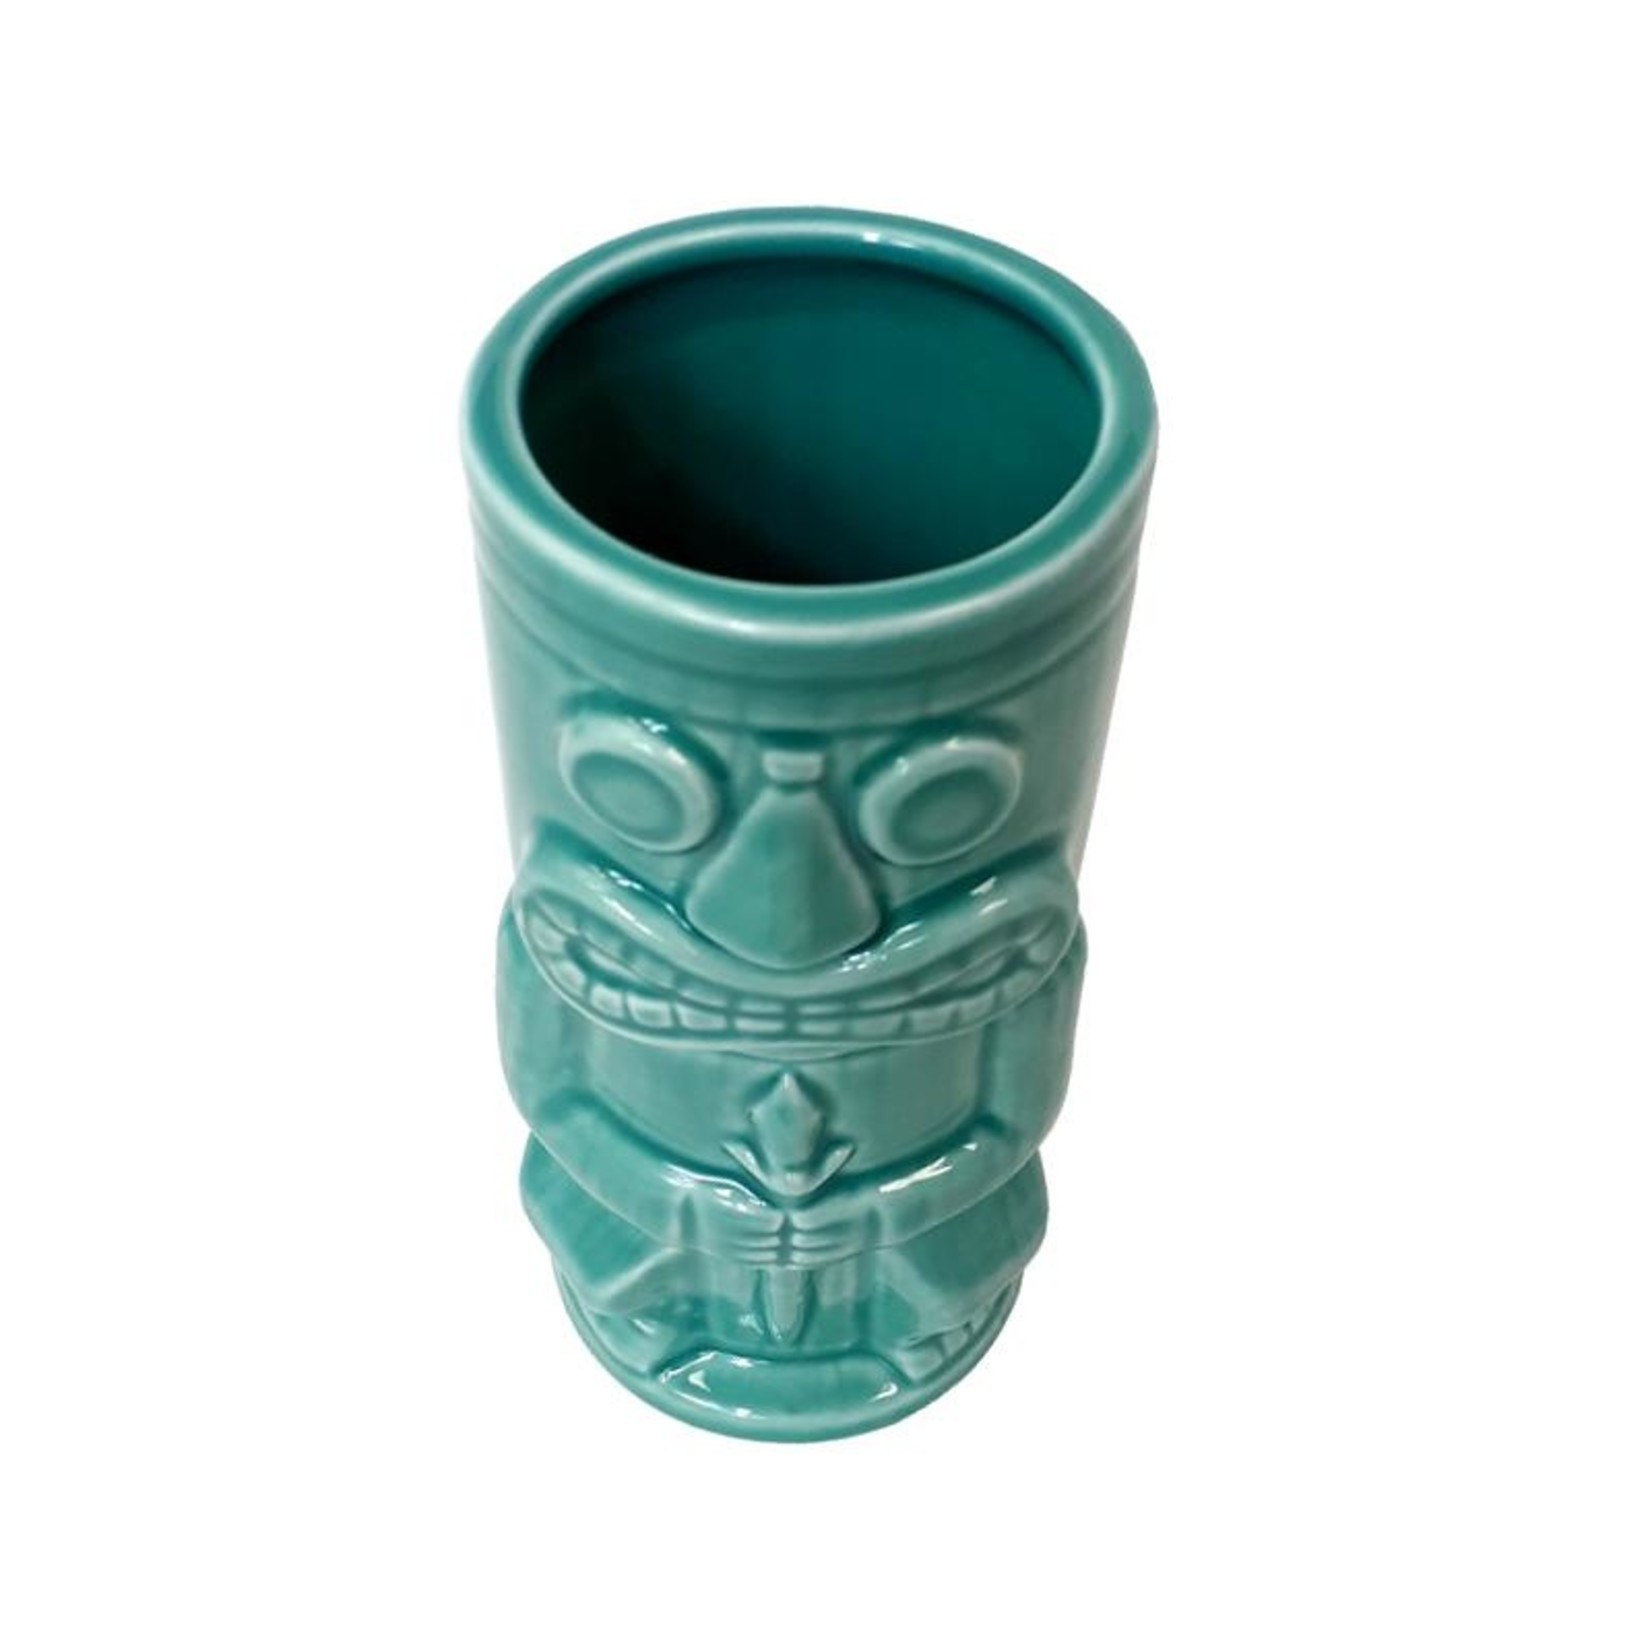 Stone God Tiki Mug - Teal